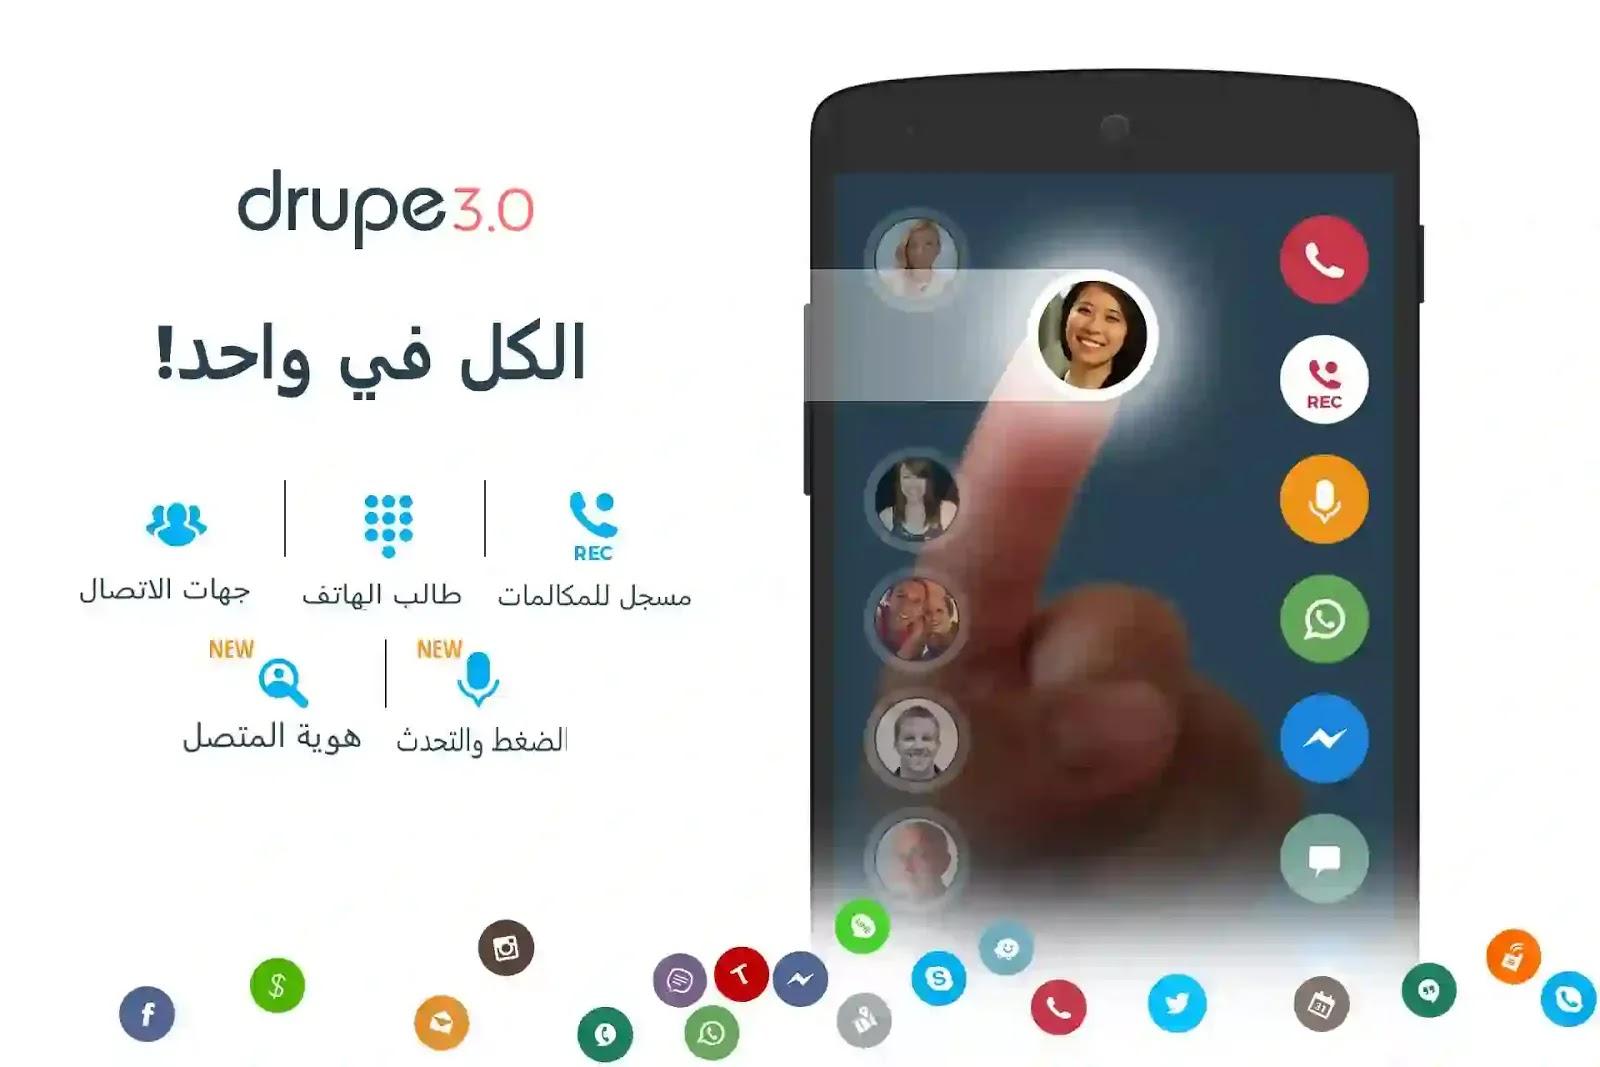 drupe - جهات الاتصال ومعرف المتصل